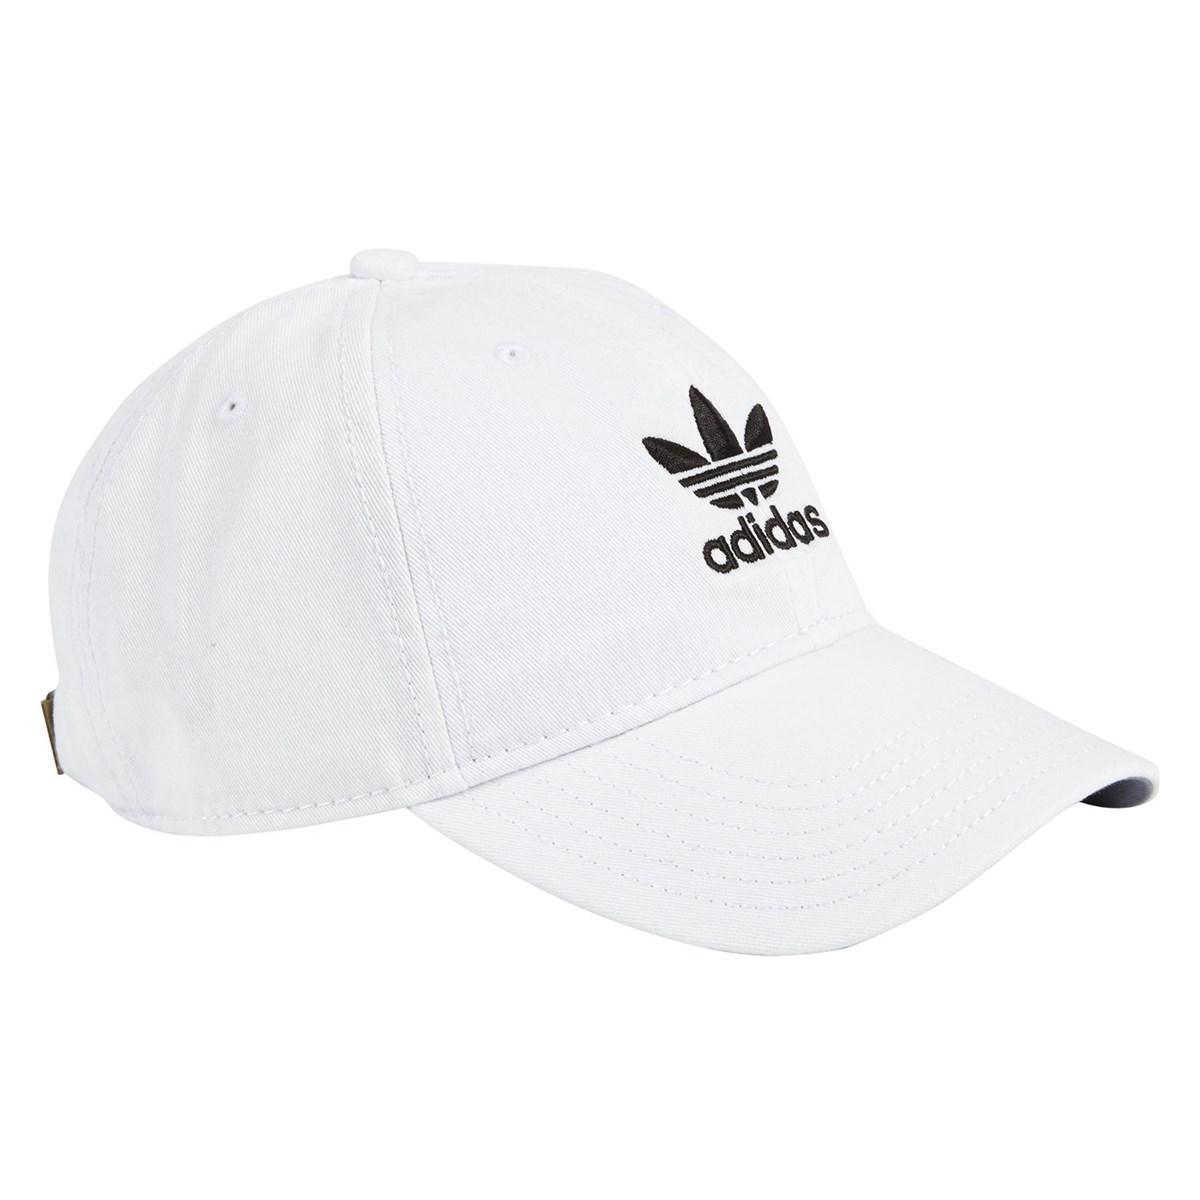 Originals Relaxed White Cap